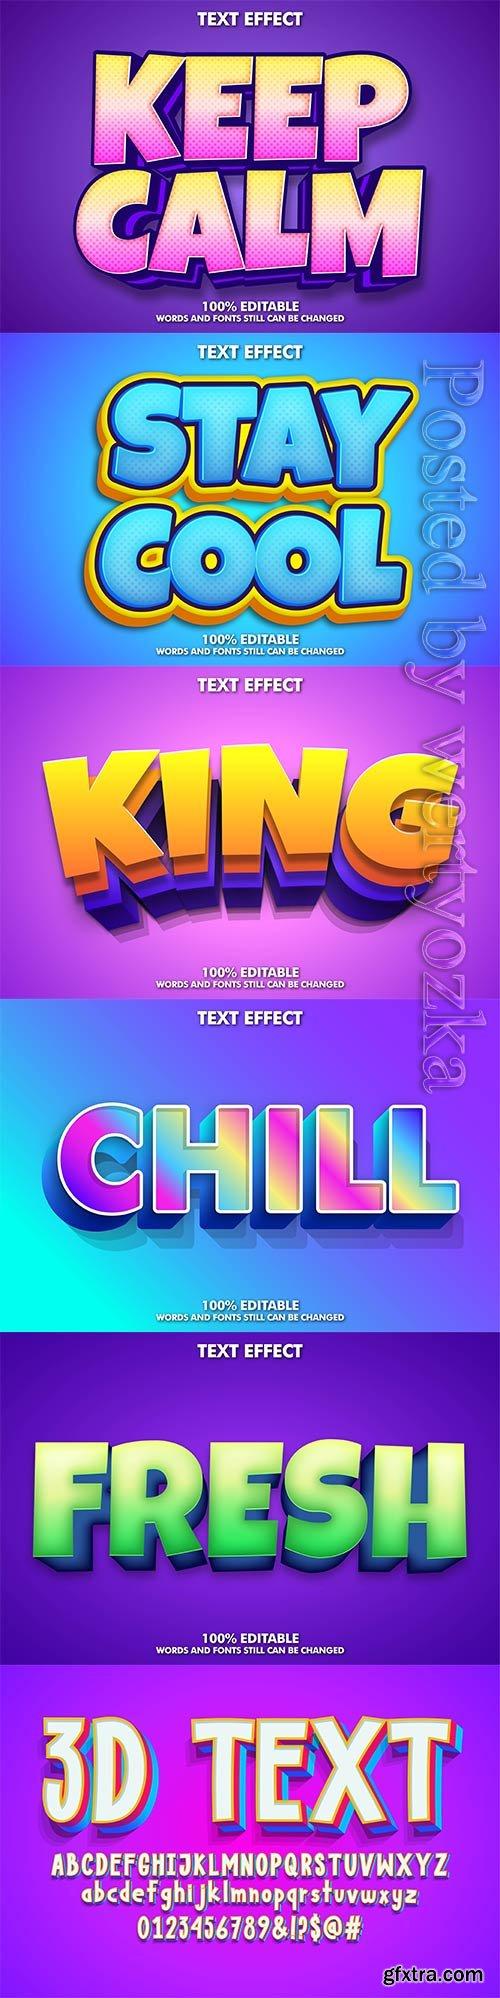 3d editable text style effect vector vol 271